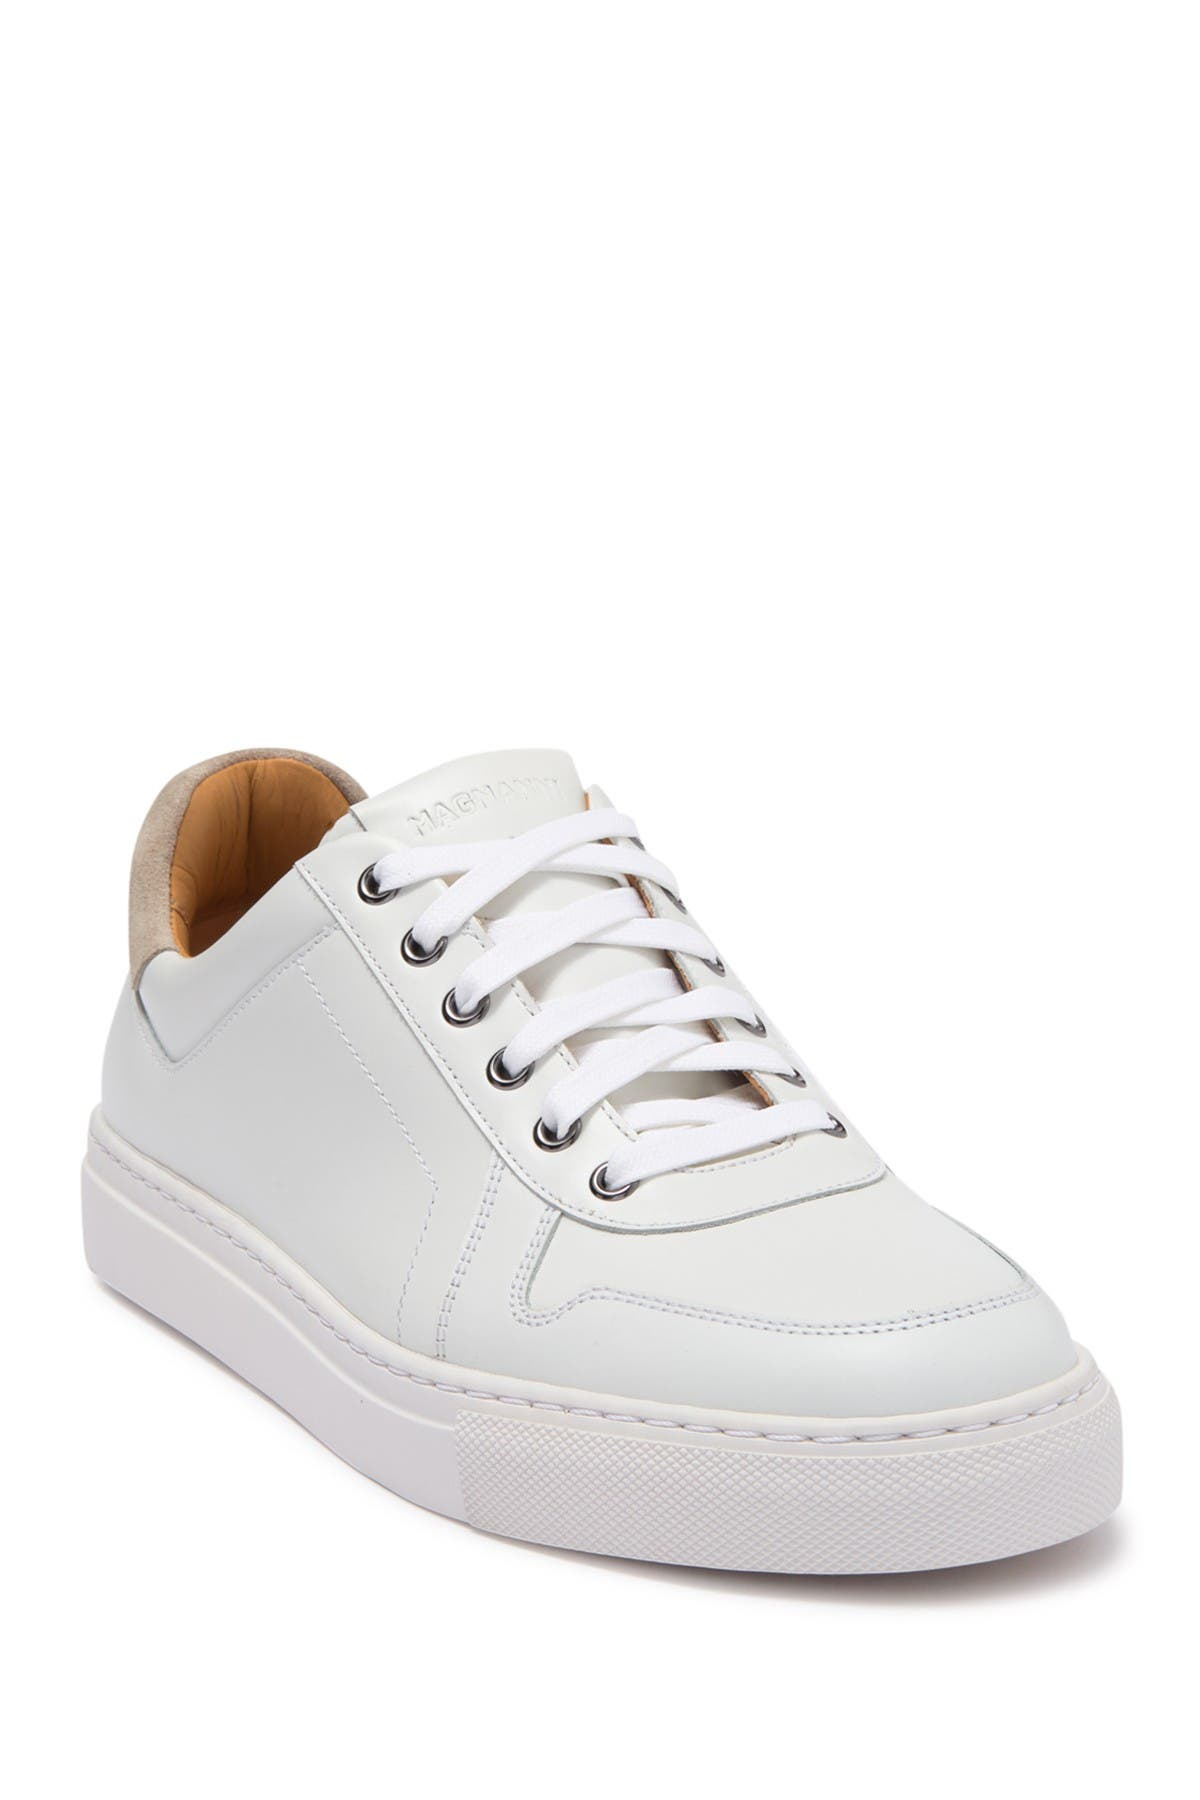 Image of Magnanni Bobbie Leather Sneaker